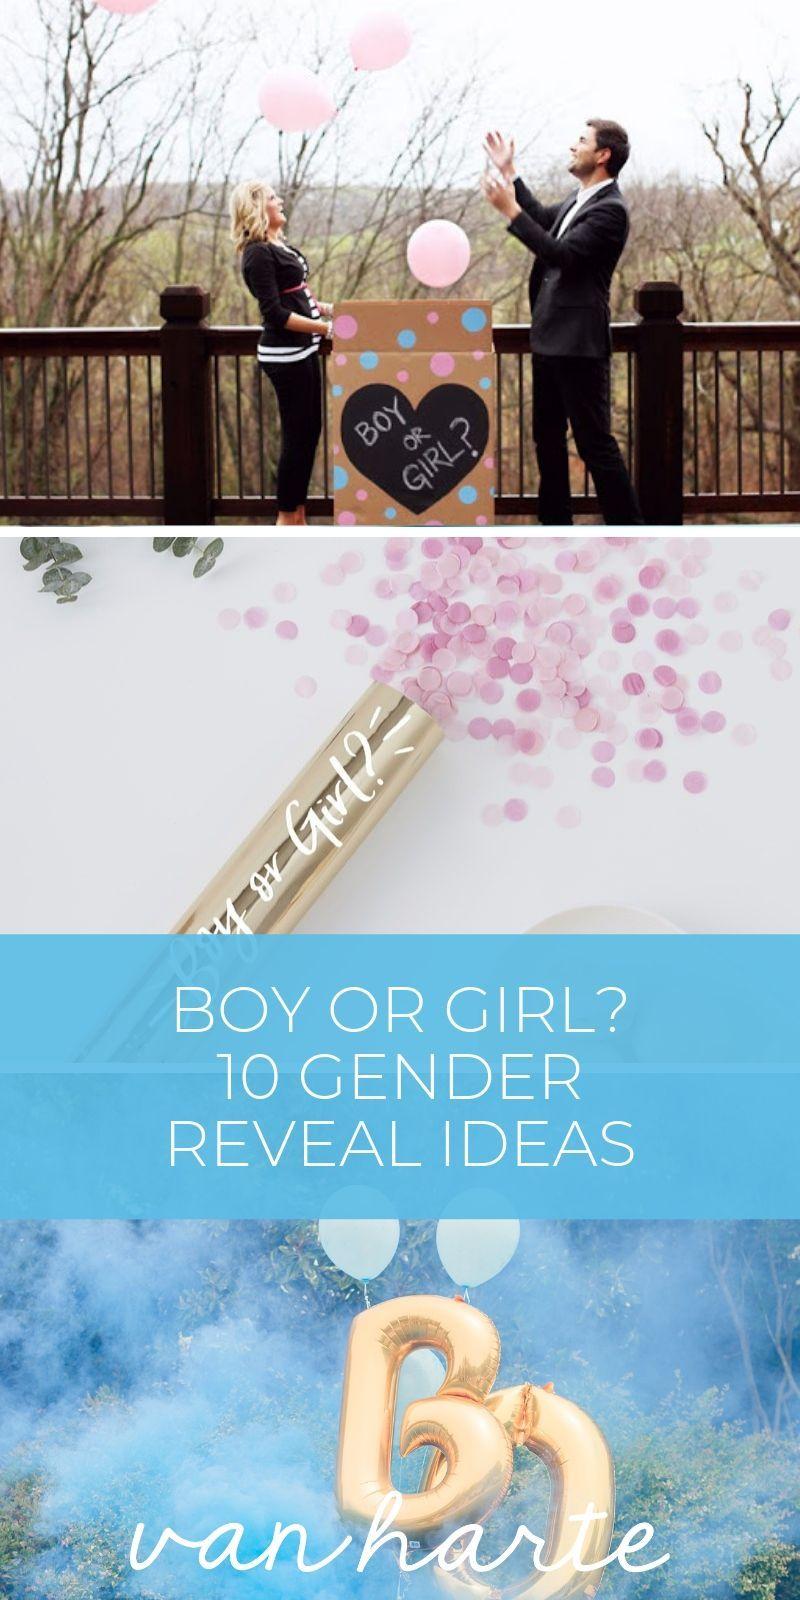 Junge oder Mädchen? 10 Gender Reveal Party Ideen | van harte Blog